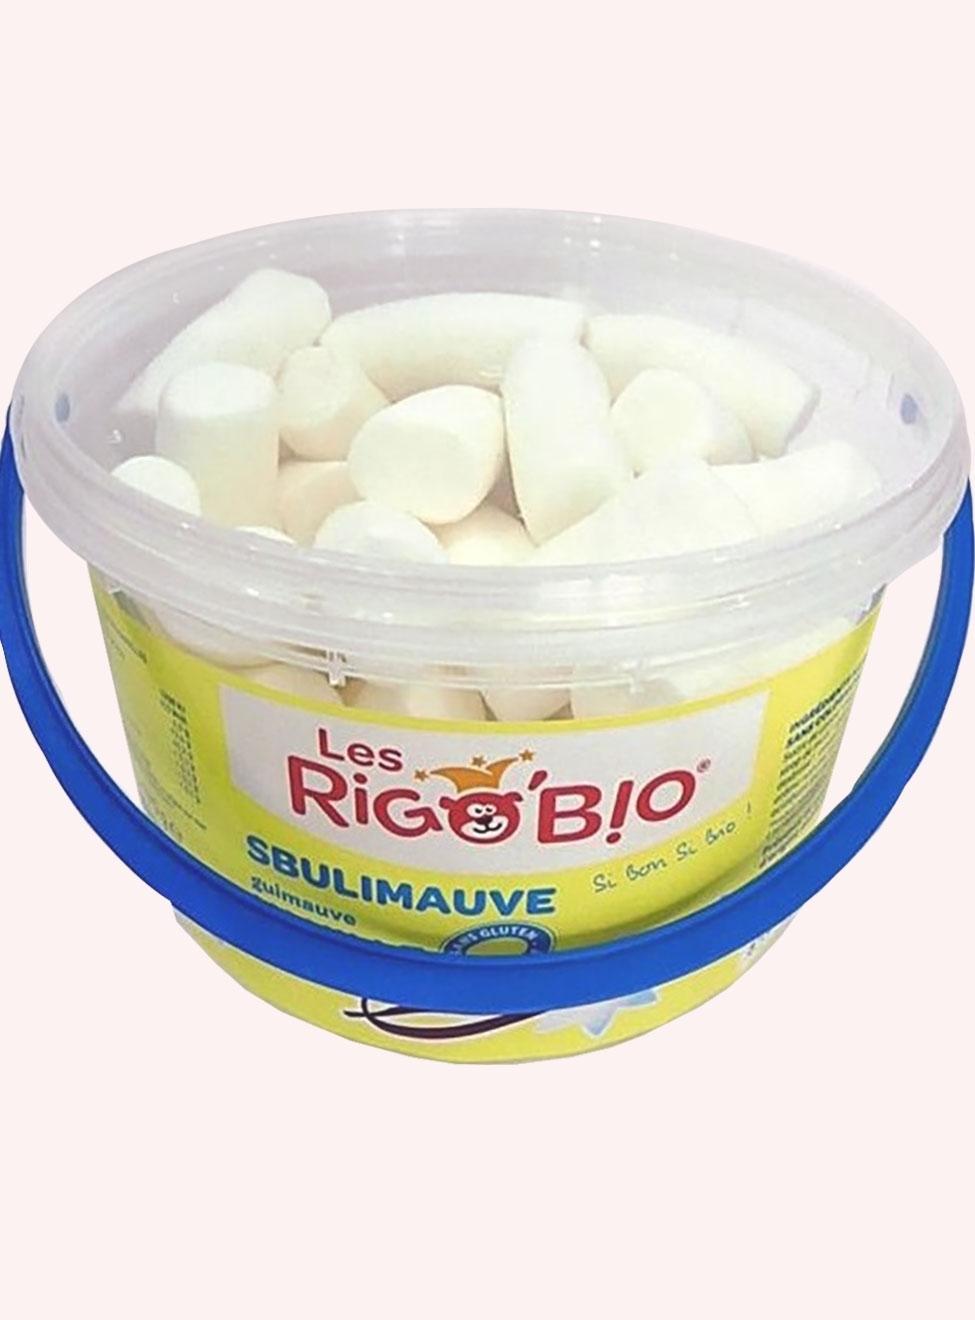 RIGOBIO Sbulimauve en pot - réf.3310